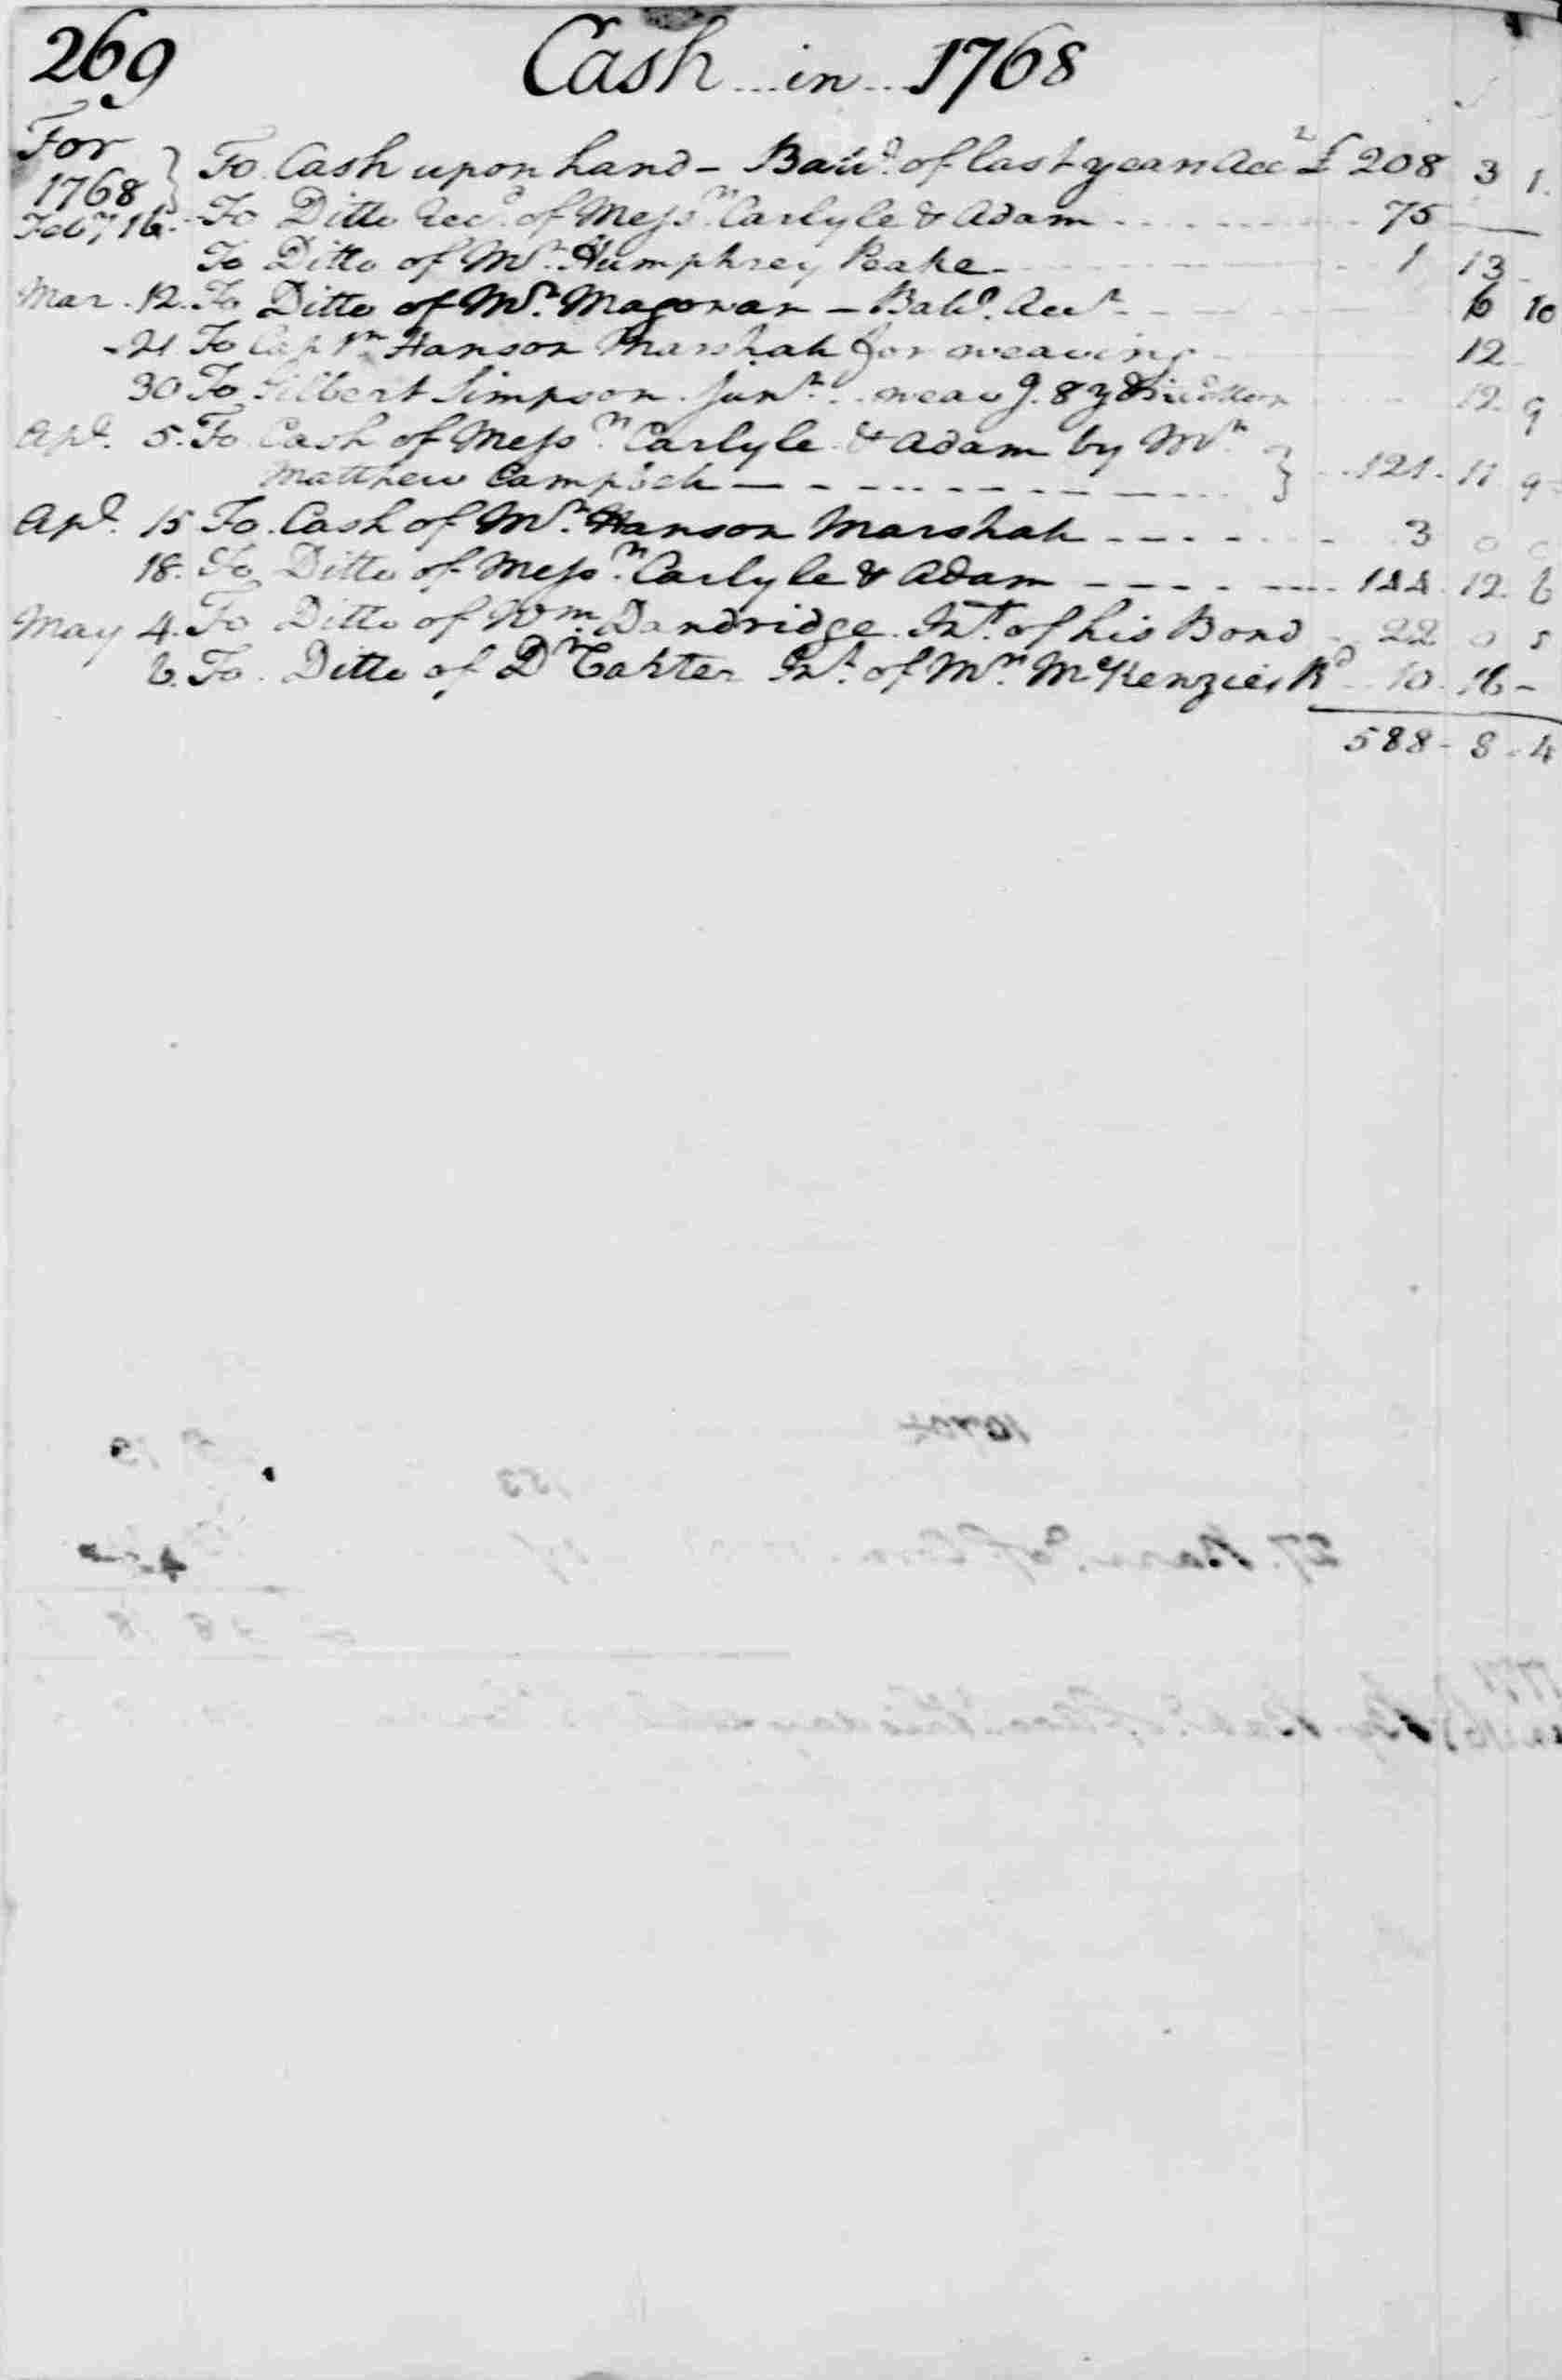 Ledger A, folio 269, left side